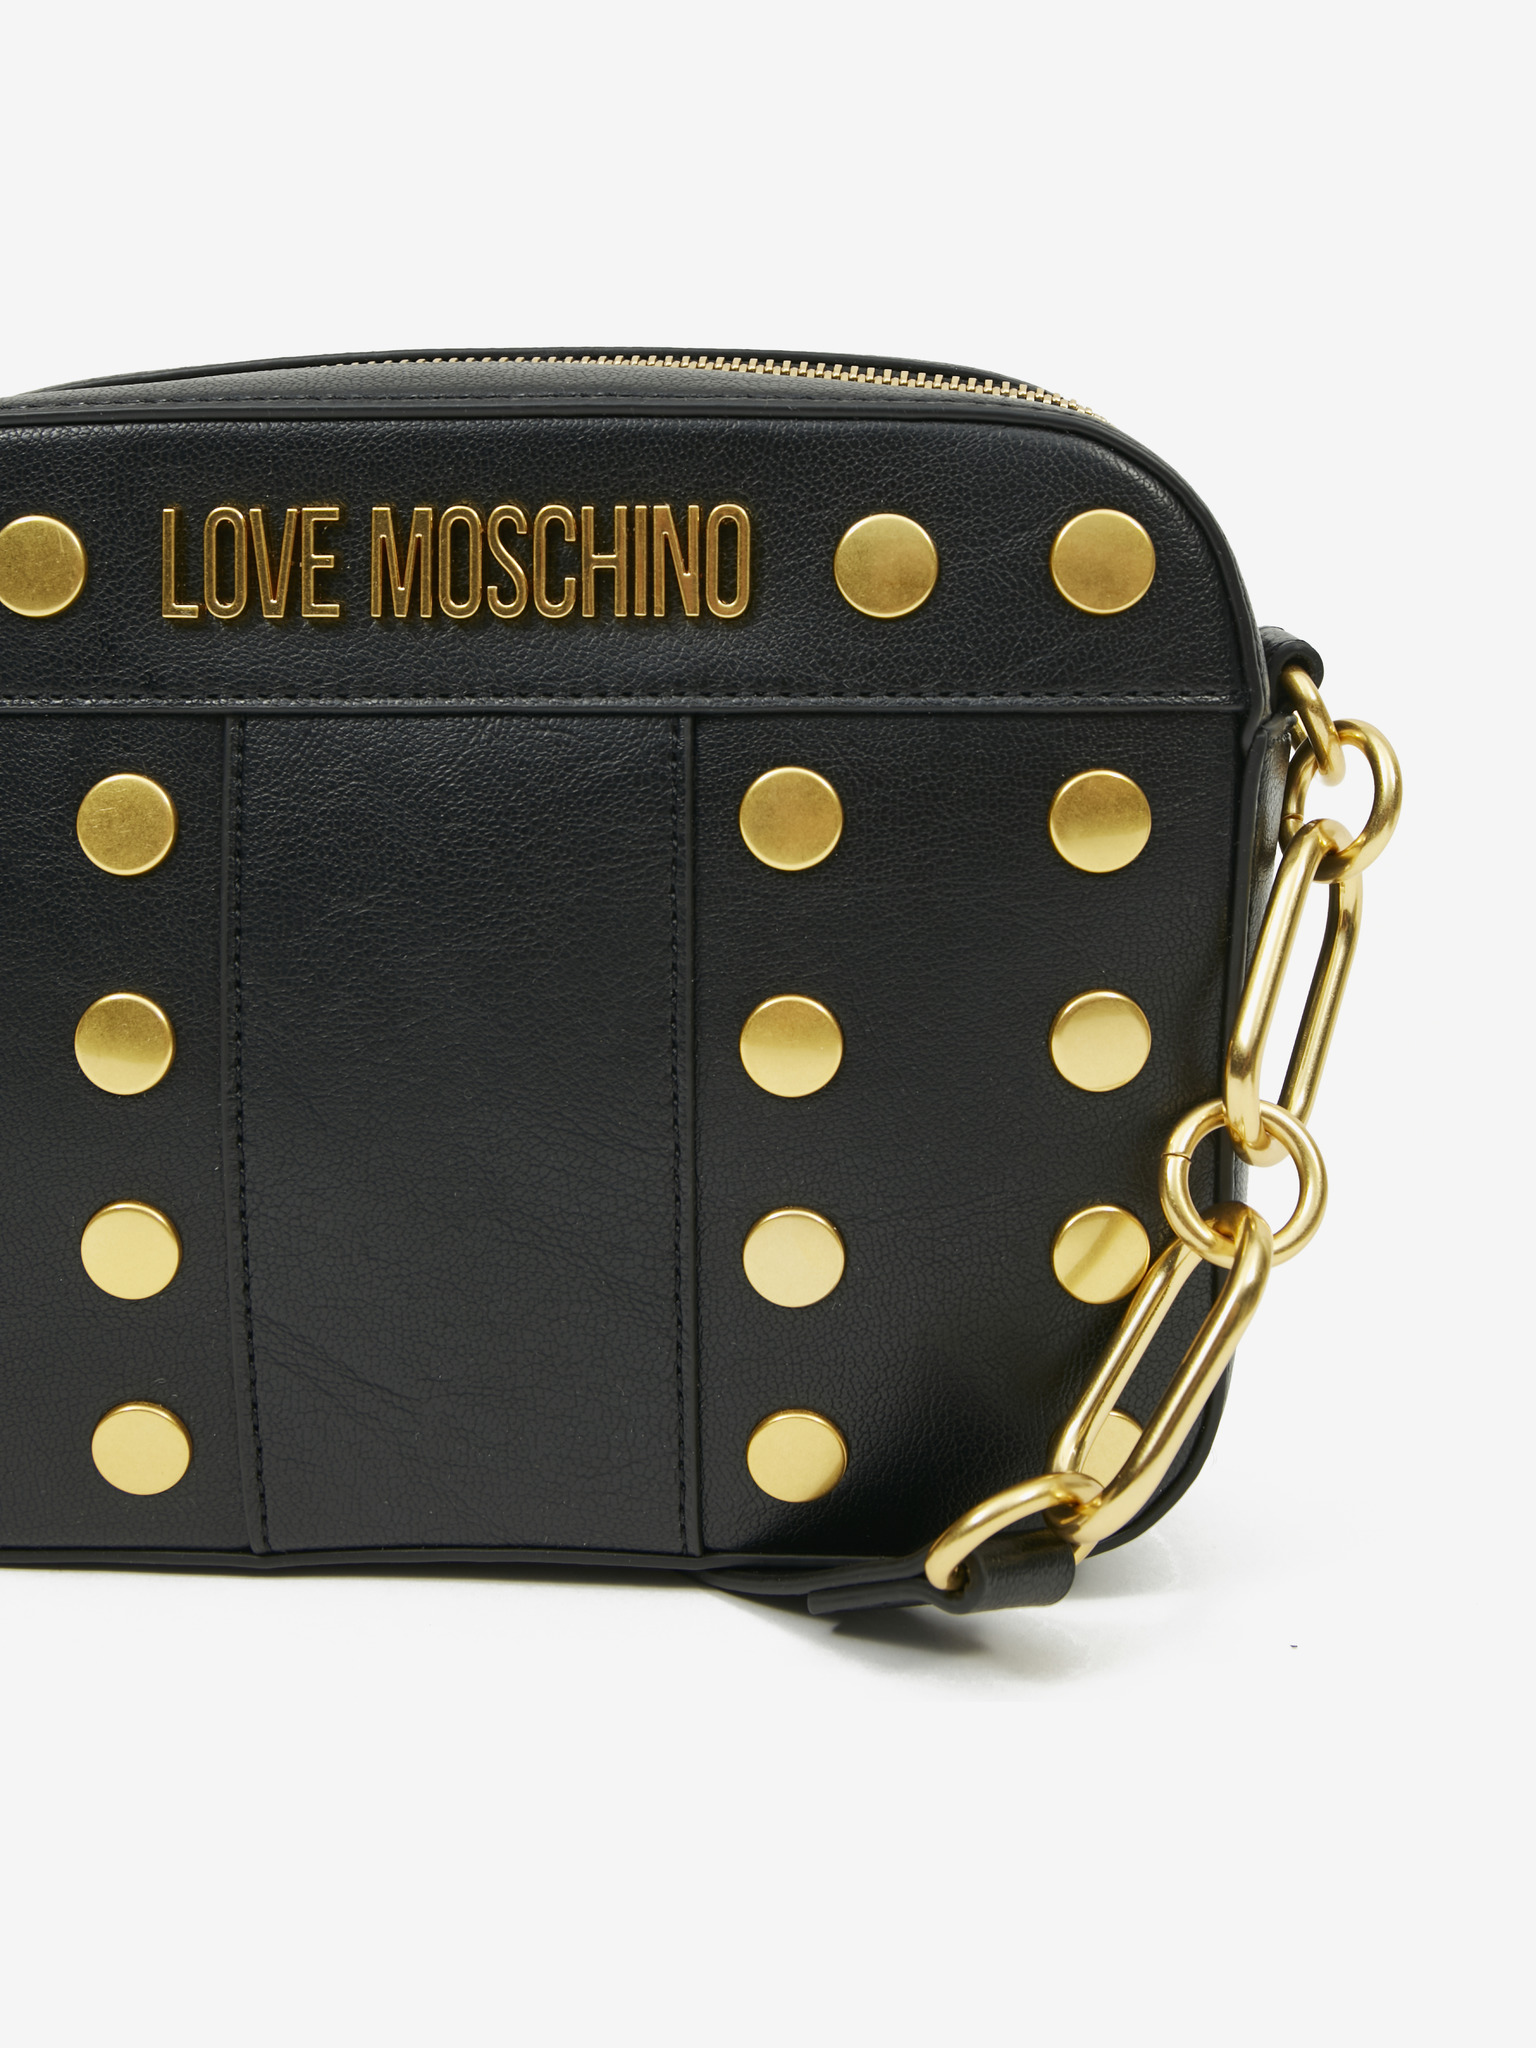 Love Moschino Nôi táska fekete